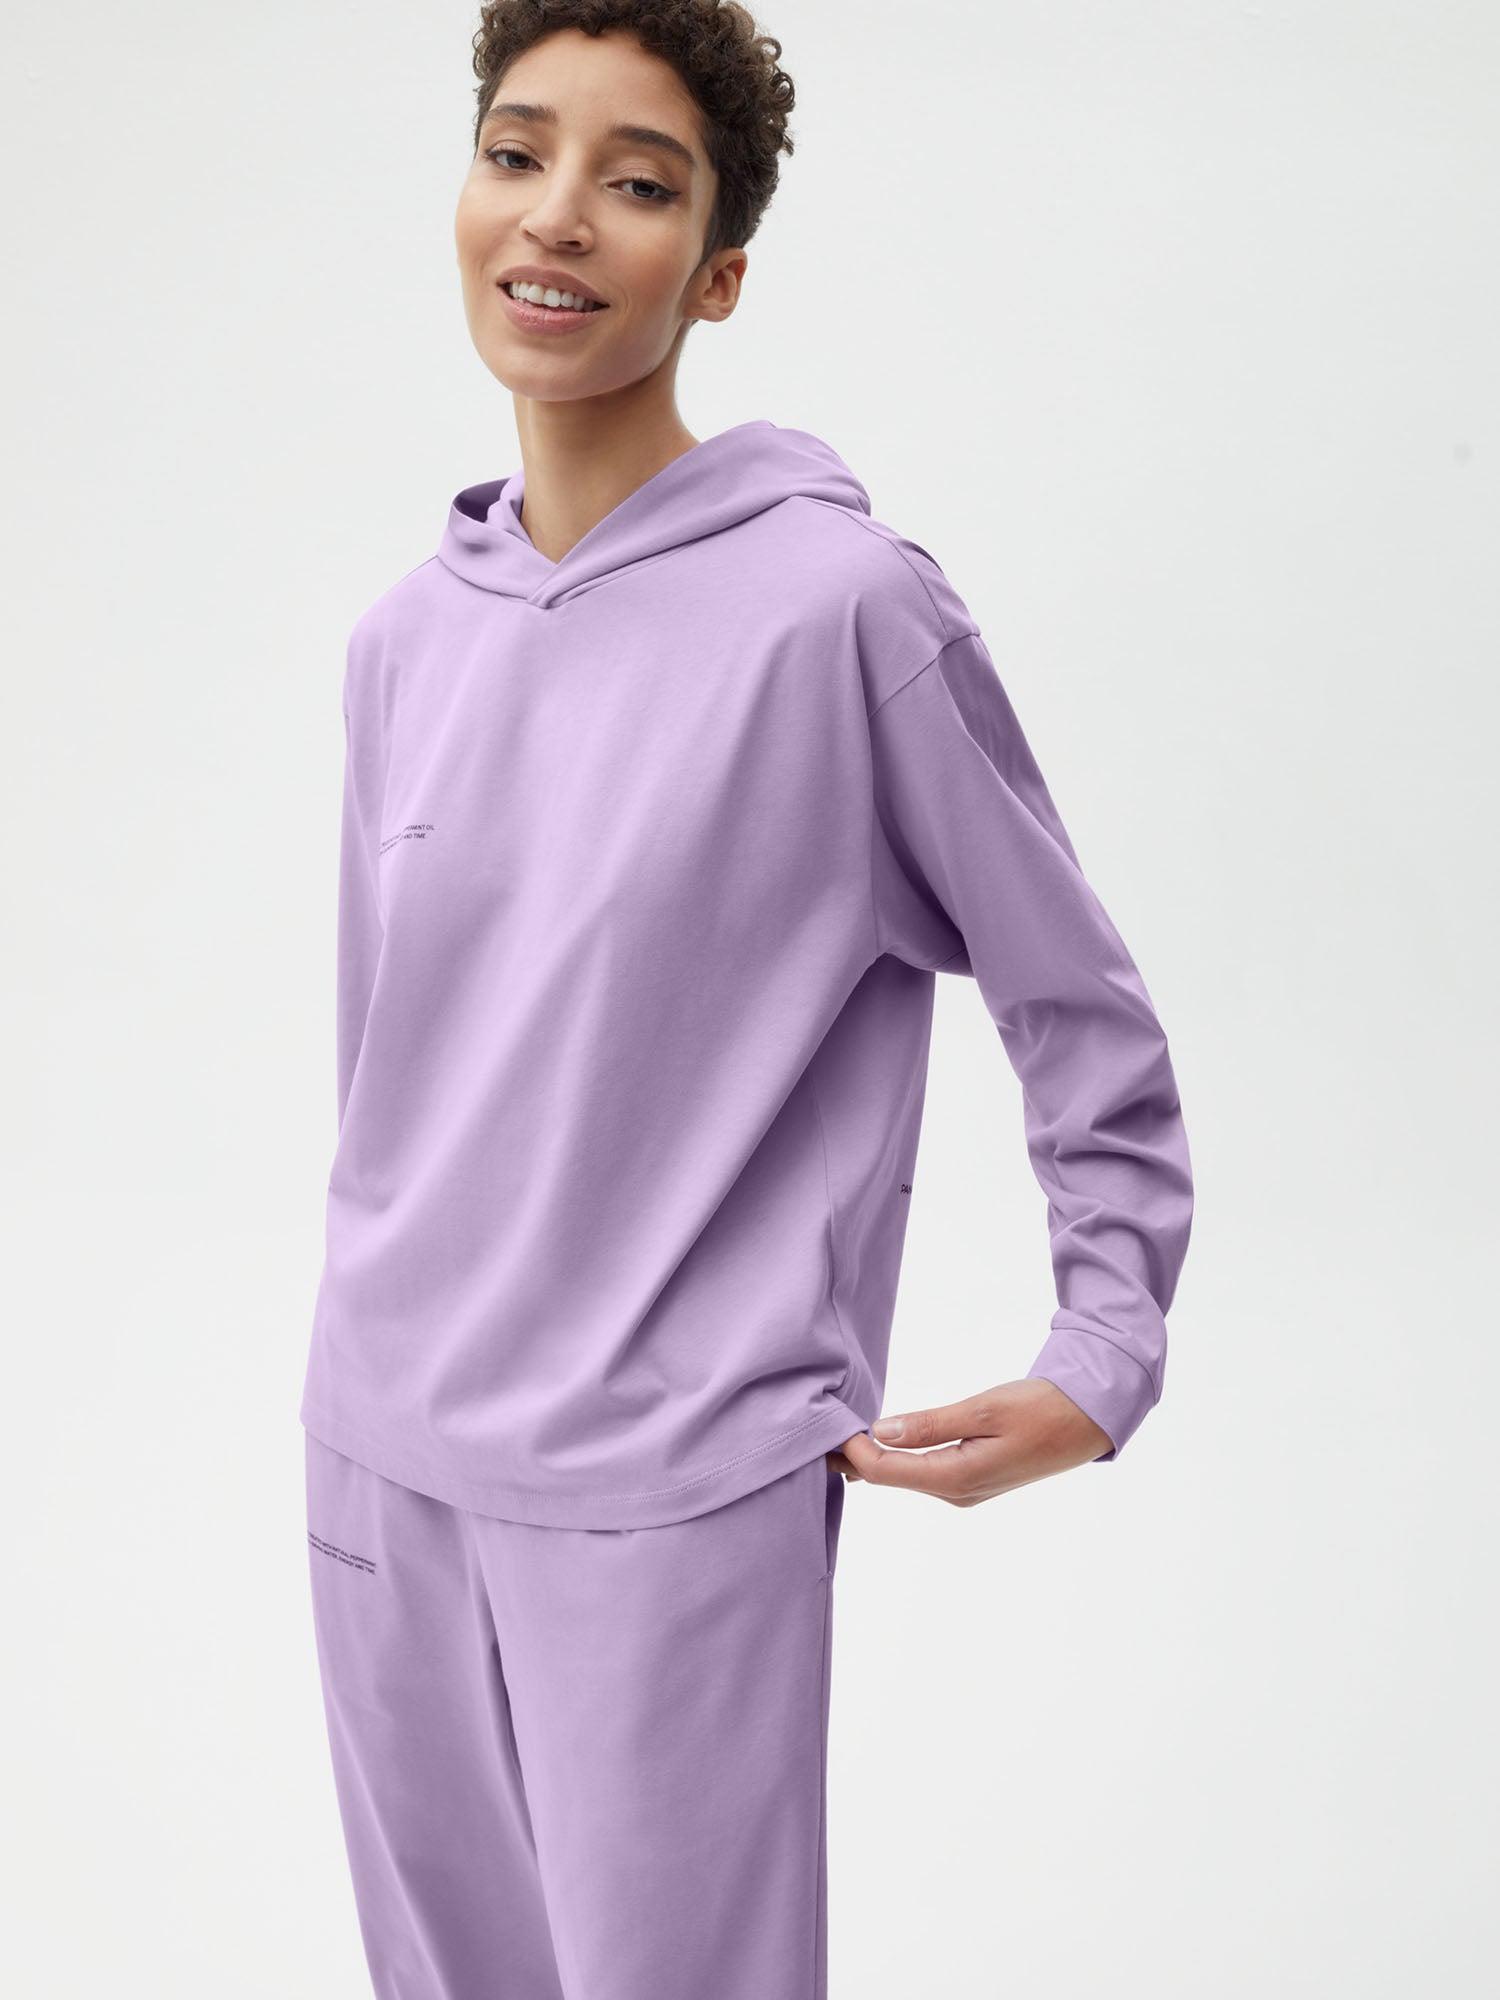 Women's Organic Cotton Pajama Top